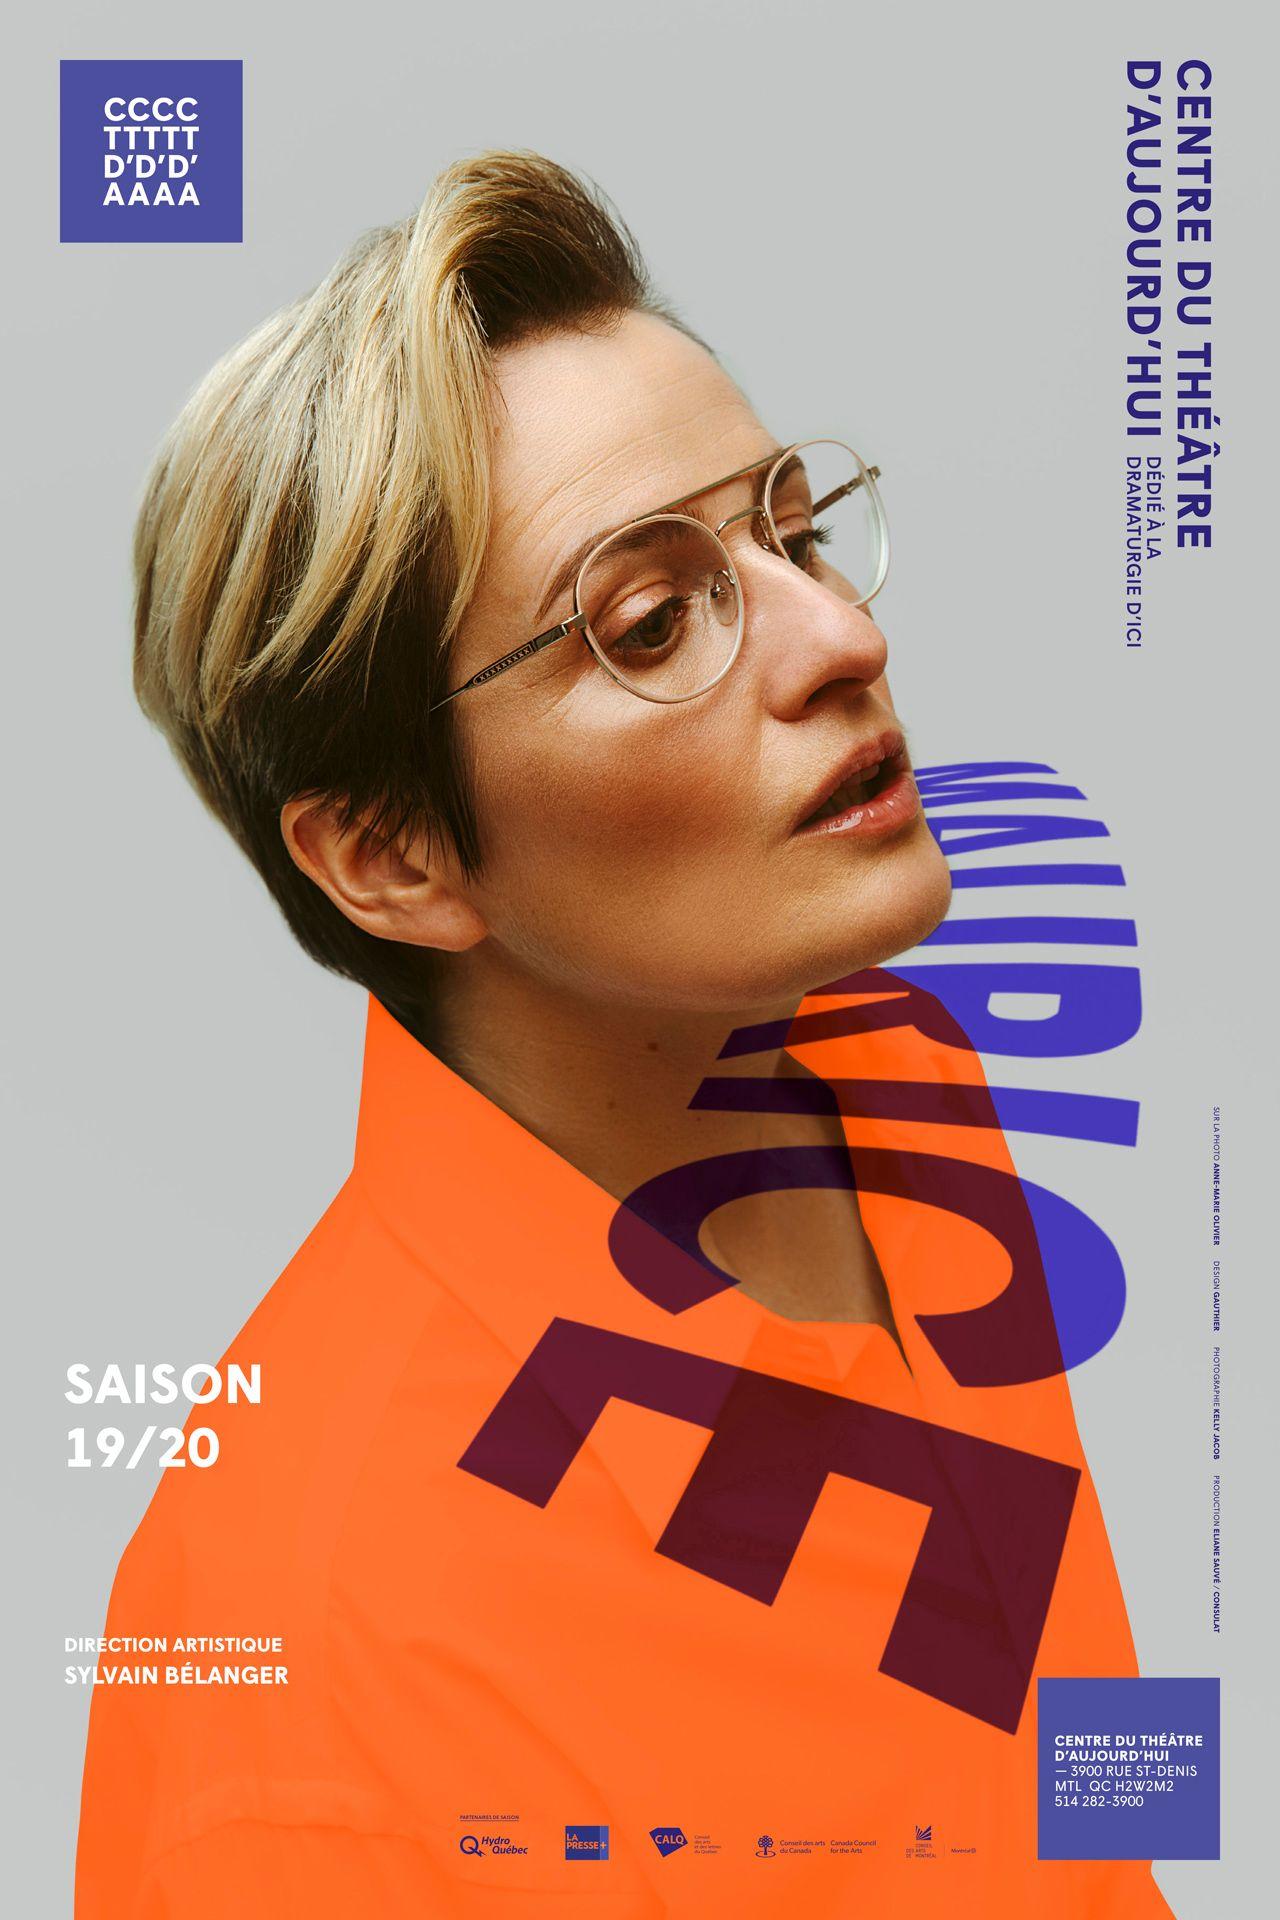 Season 2019 - 2020 of Centre du Theatre D'Aujourd'hui photographed by Kelly Jacob